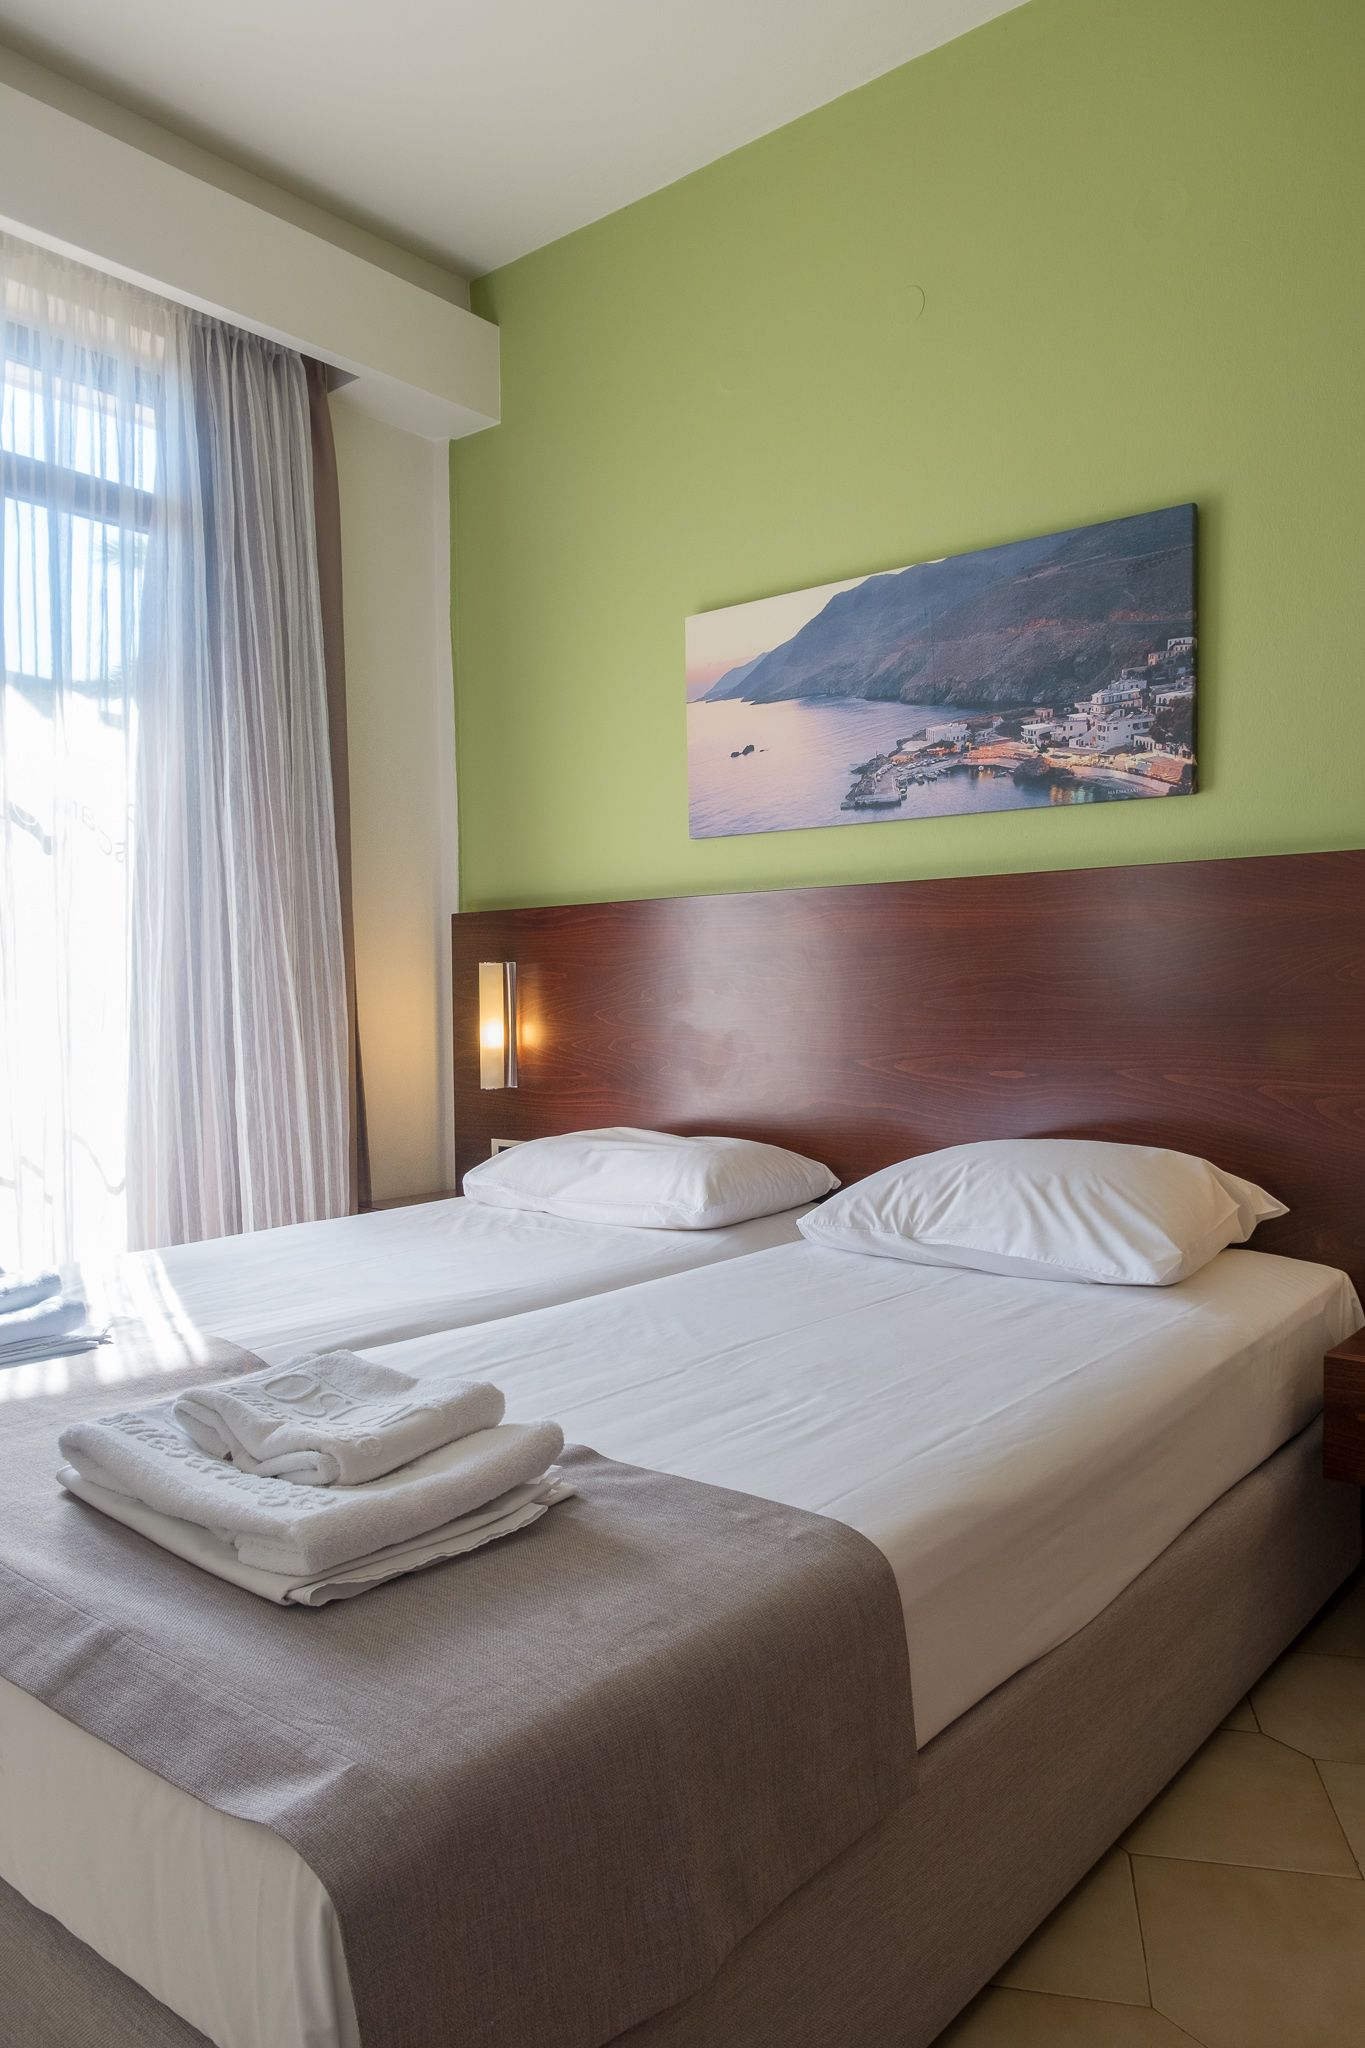 2 Bedroom Apartments in Agia Marina, Chania | 2 bedroom ...